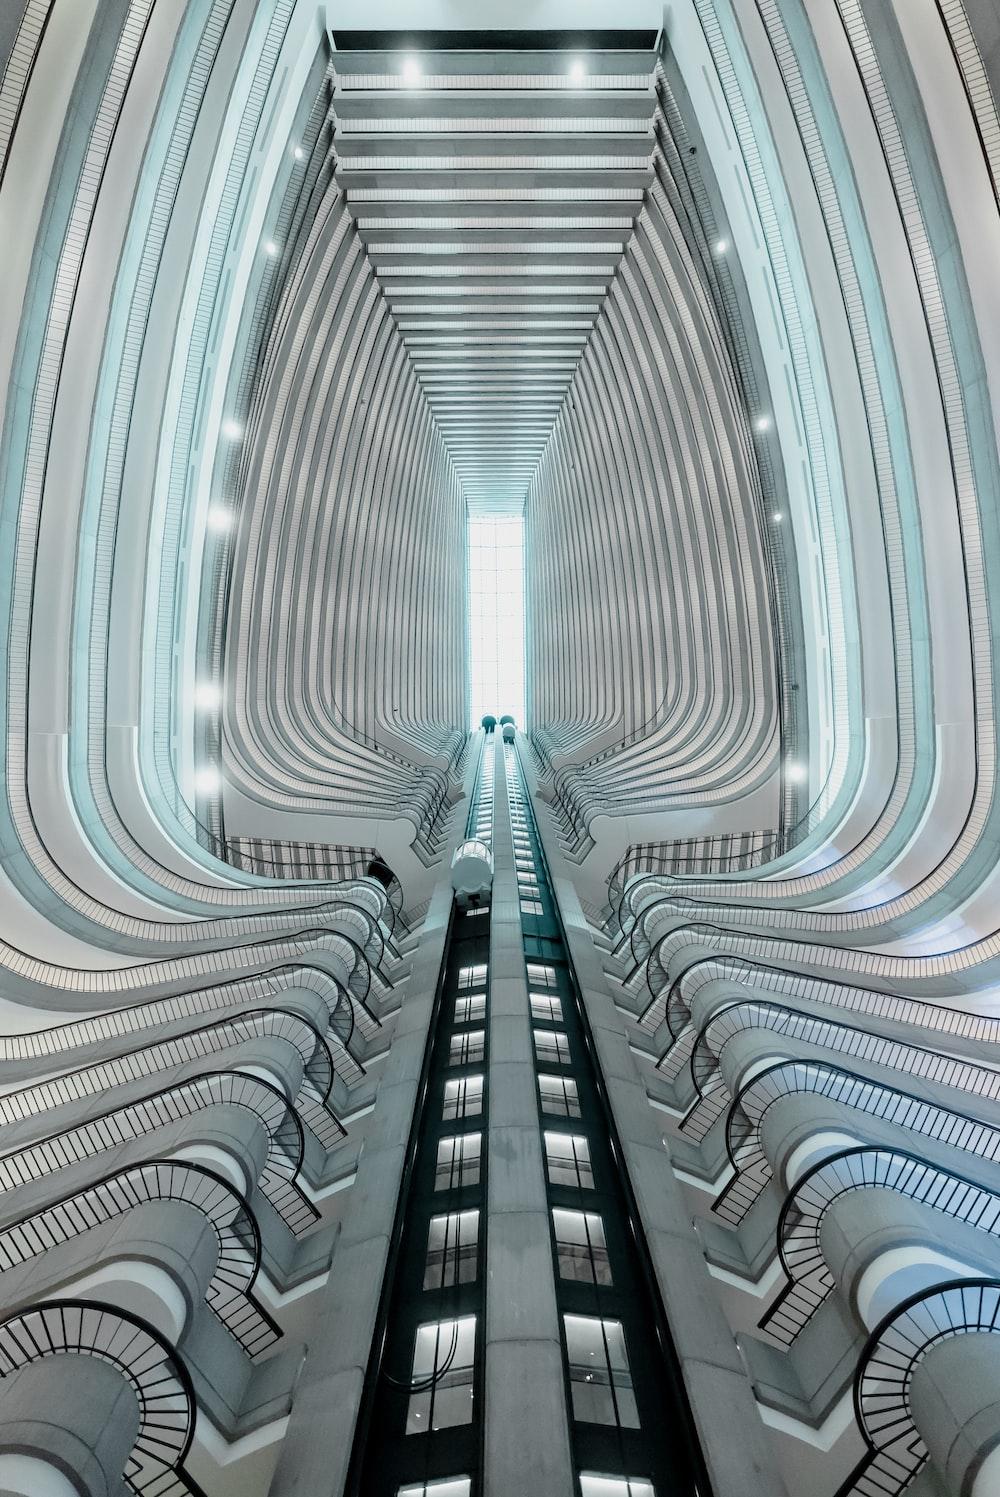 tunnel illustration